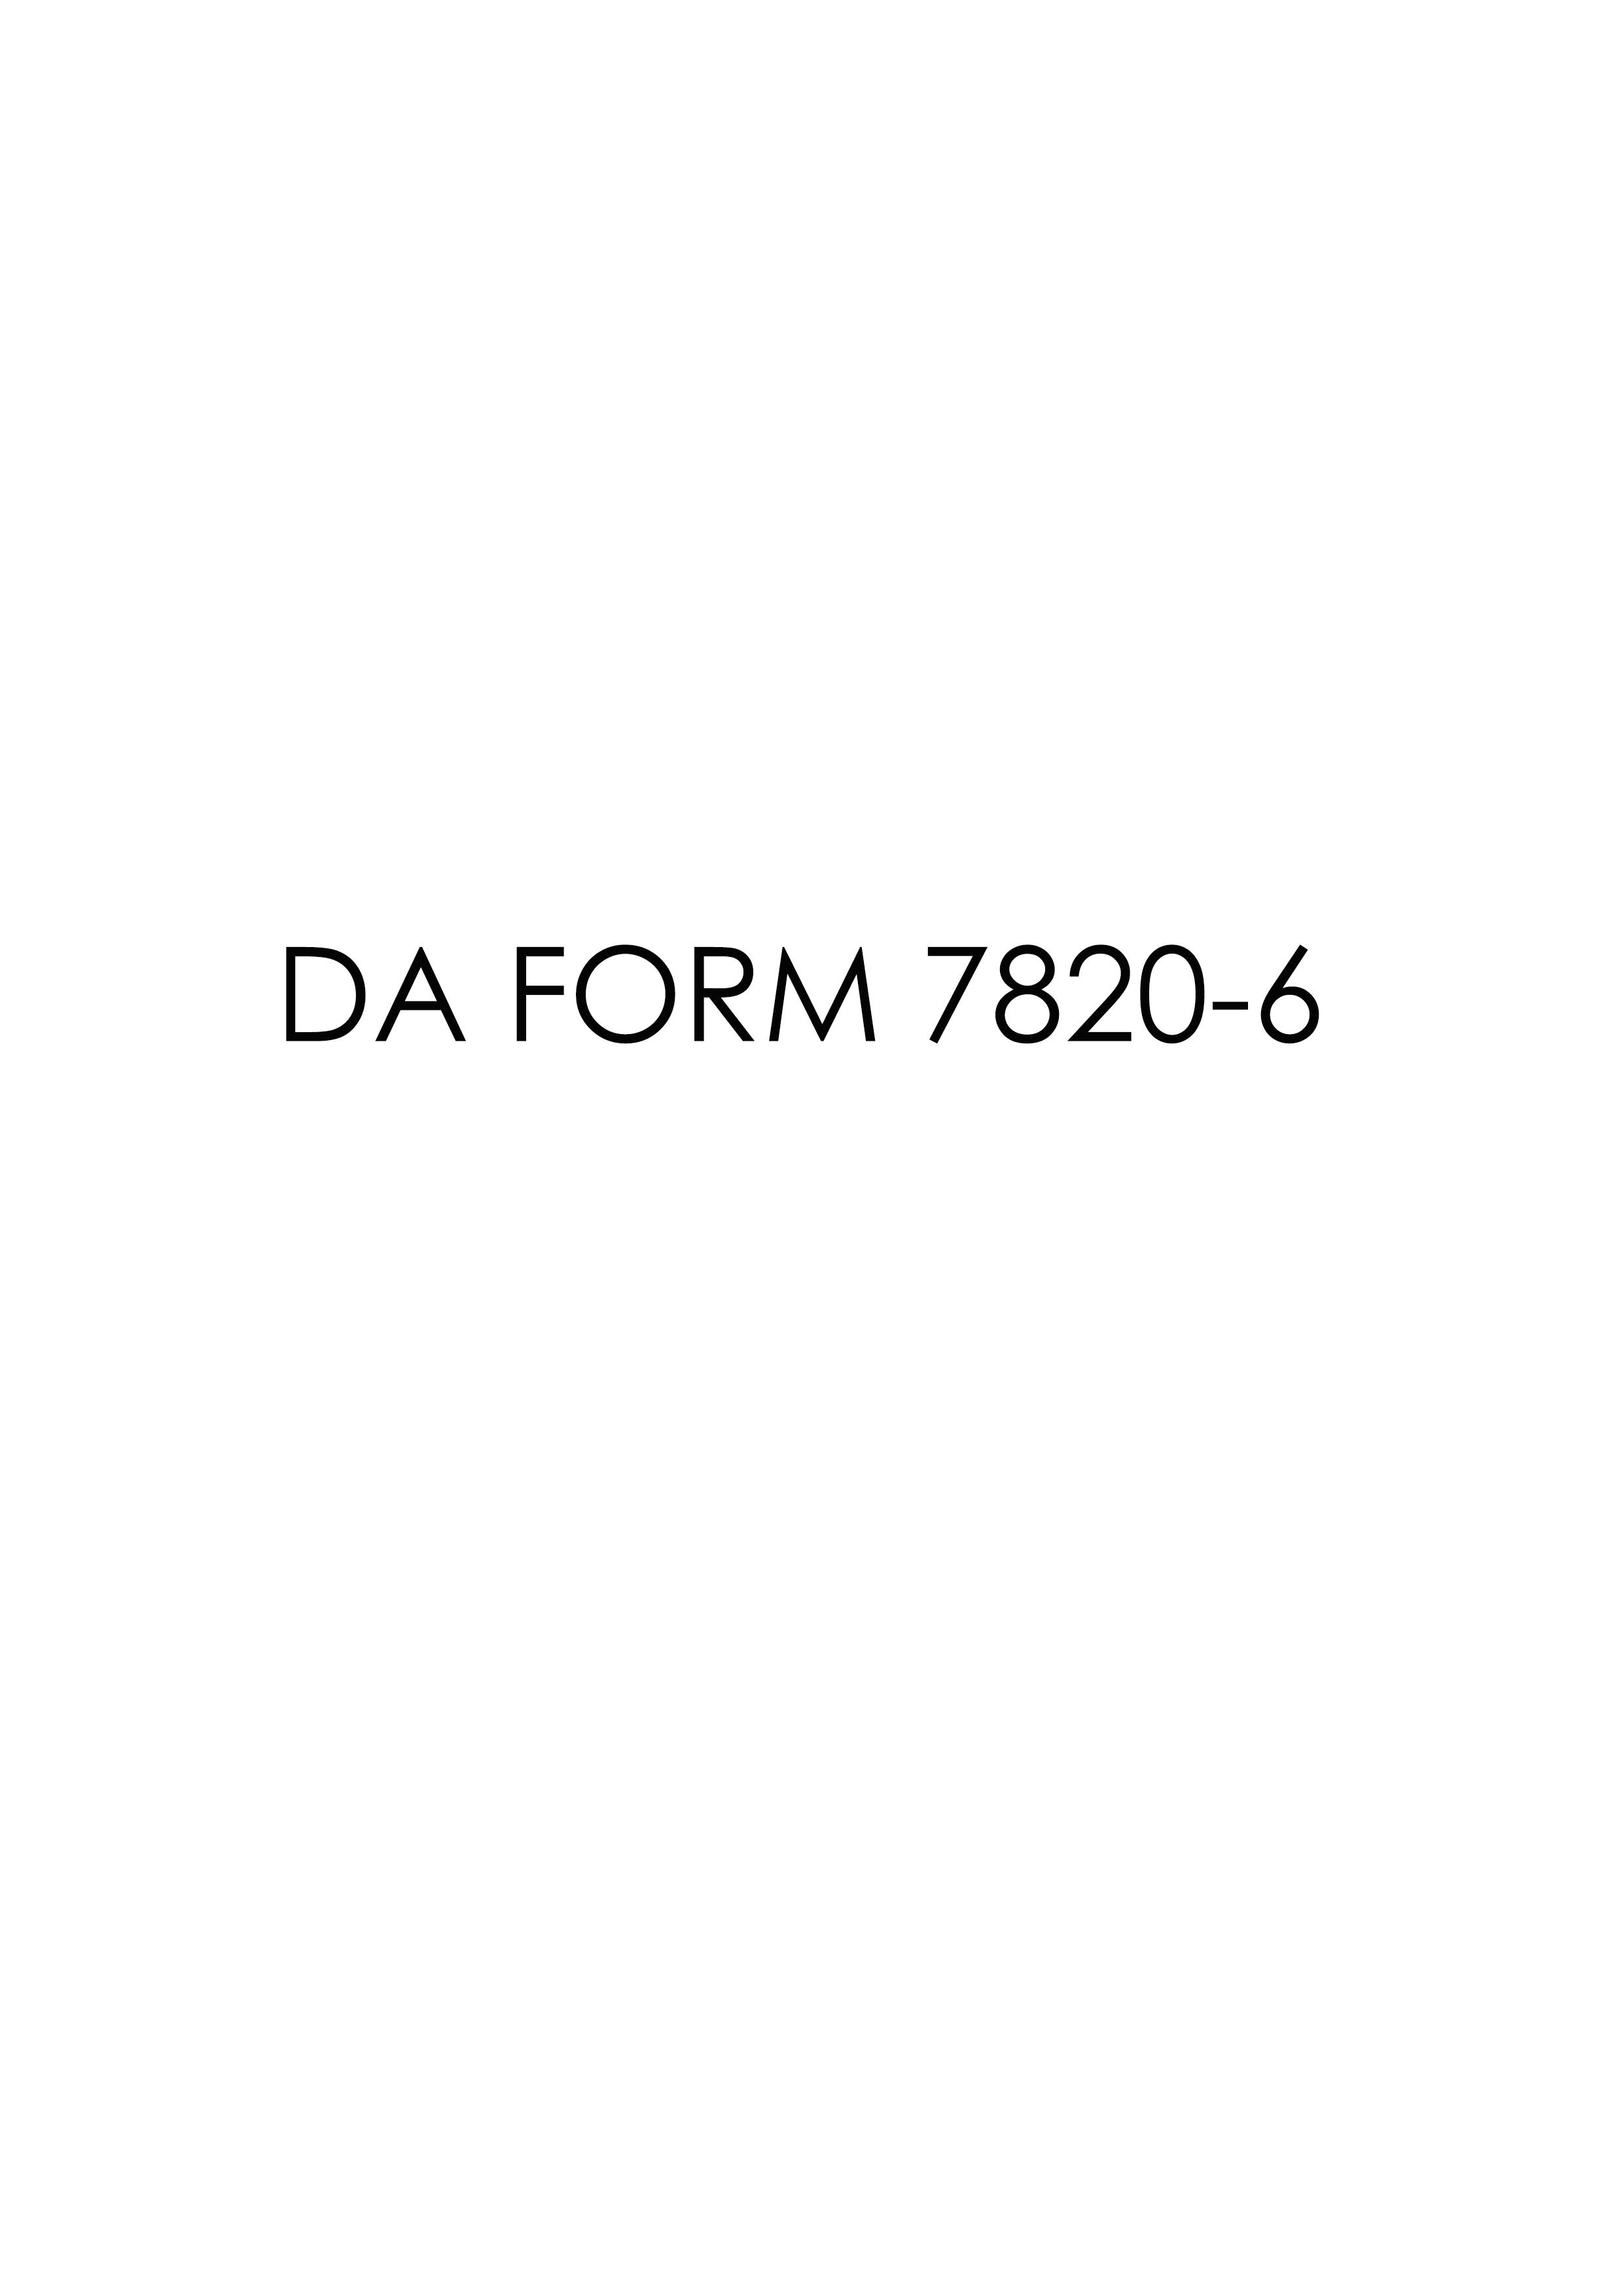 Download da Form 7820-6 Free